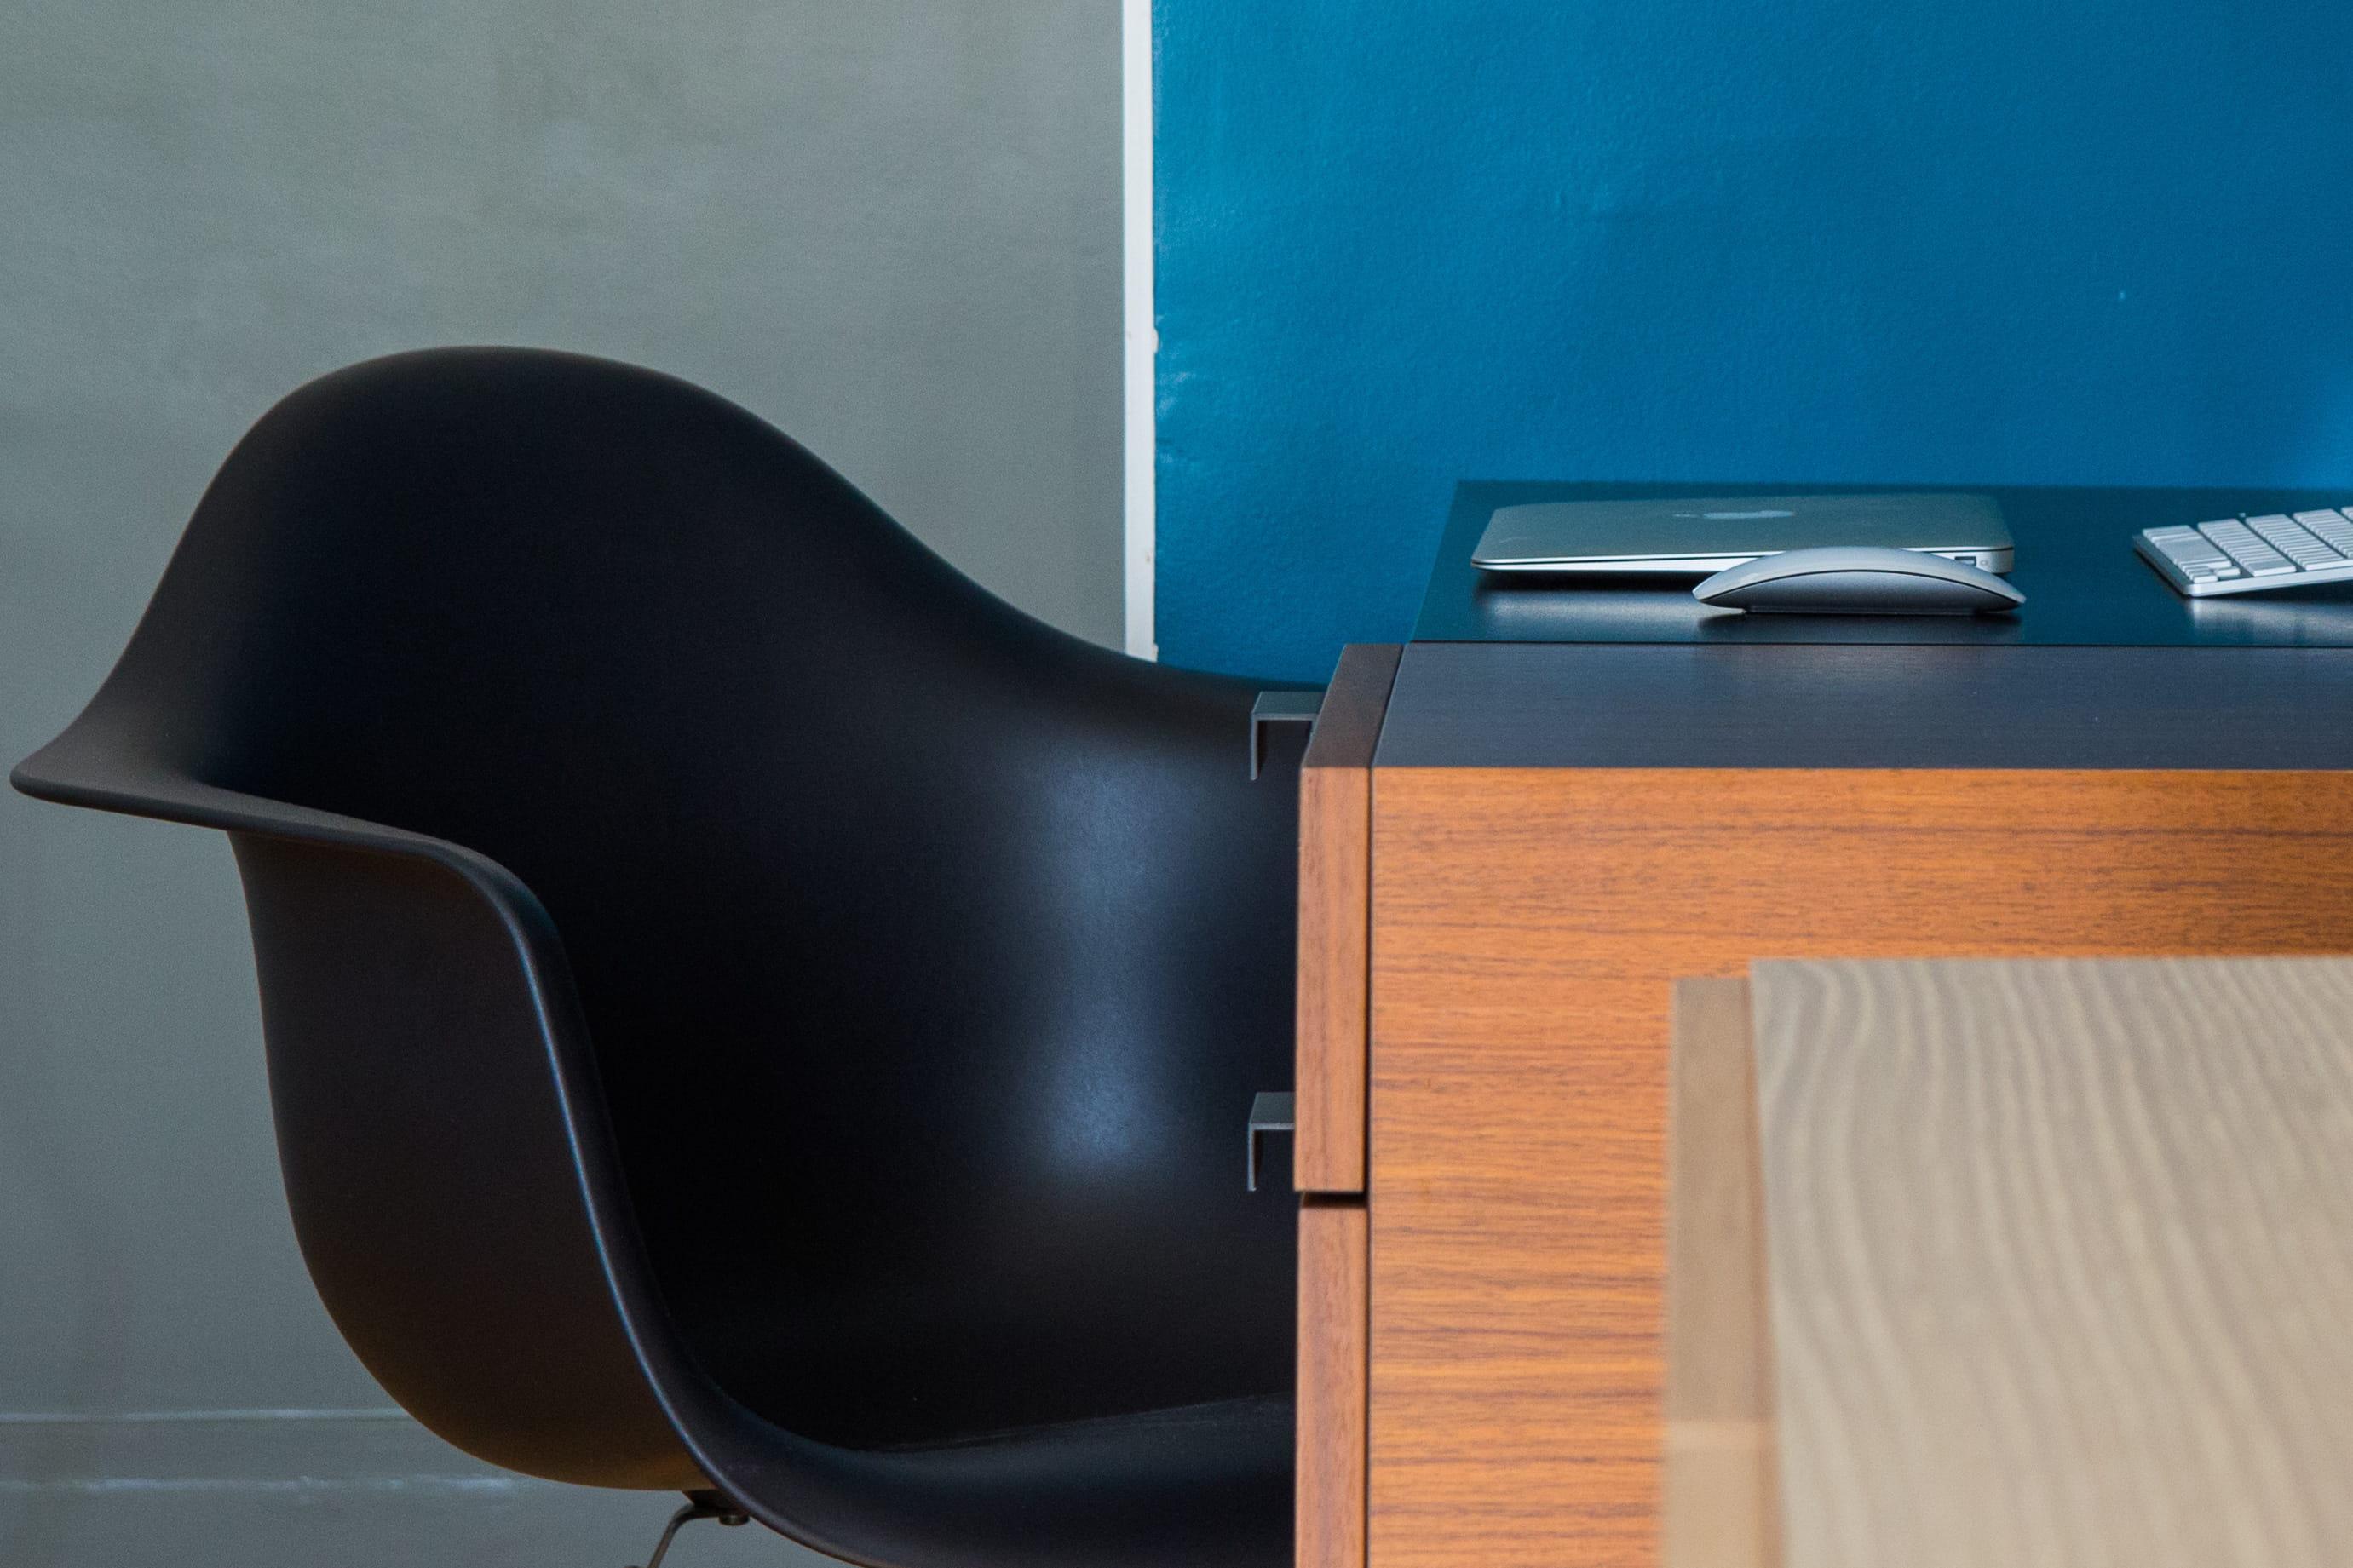 Comment bien choisir sa chaise de bureau journal des femmes - Bien choisir sa television ...